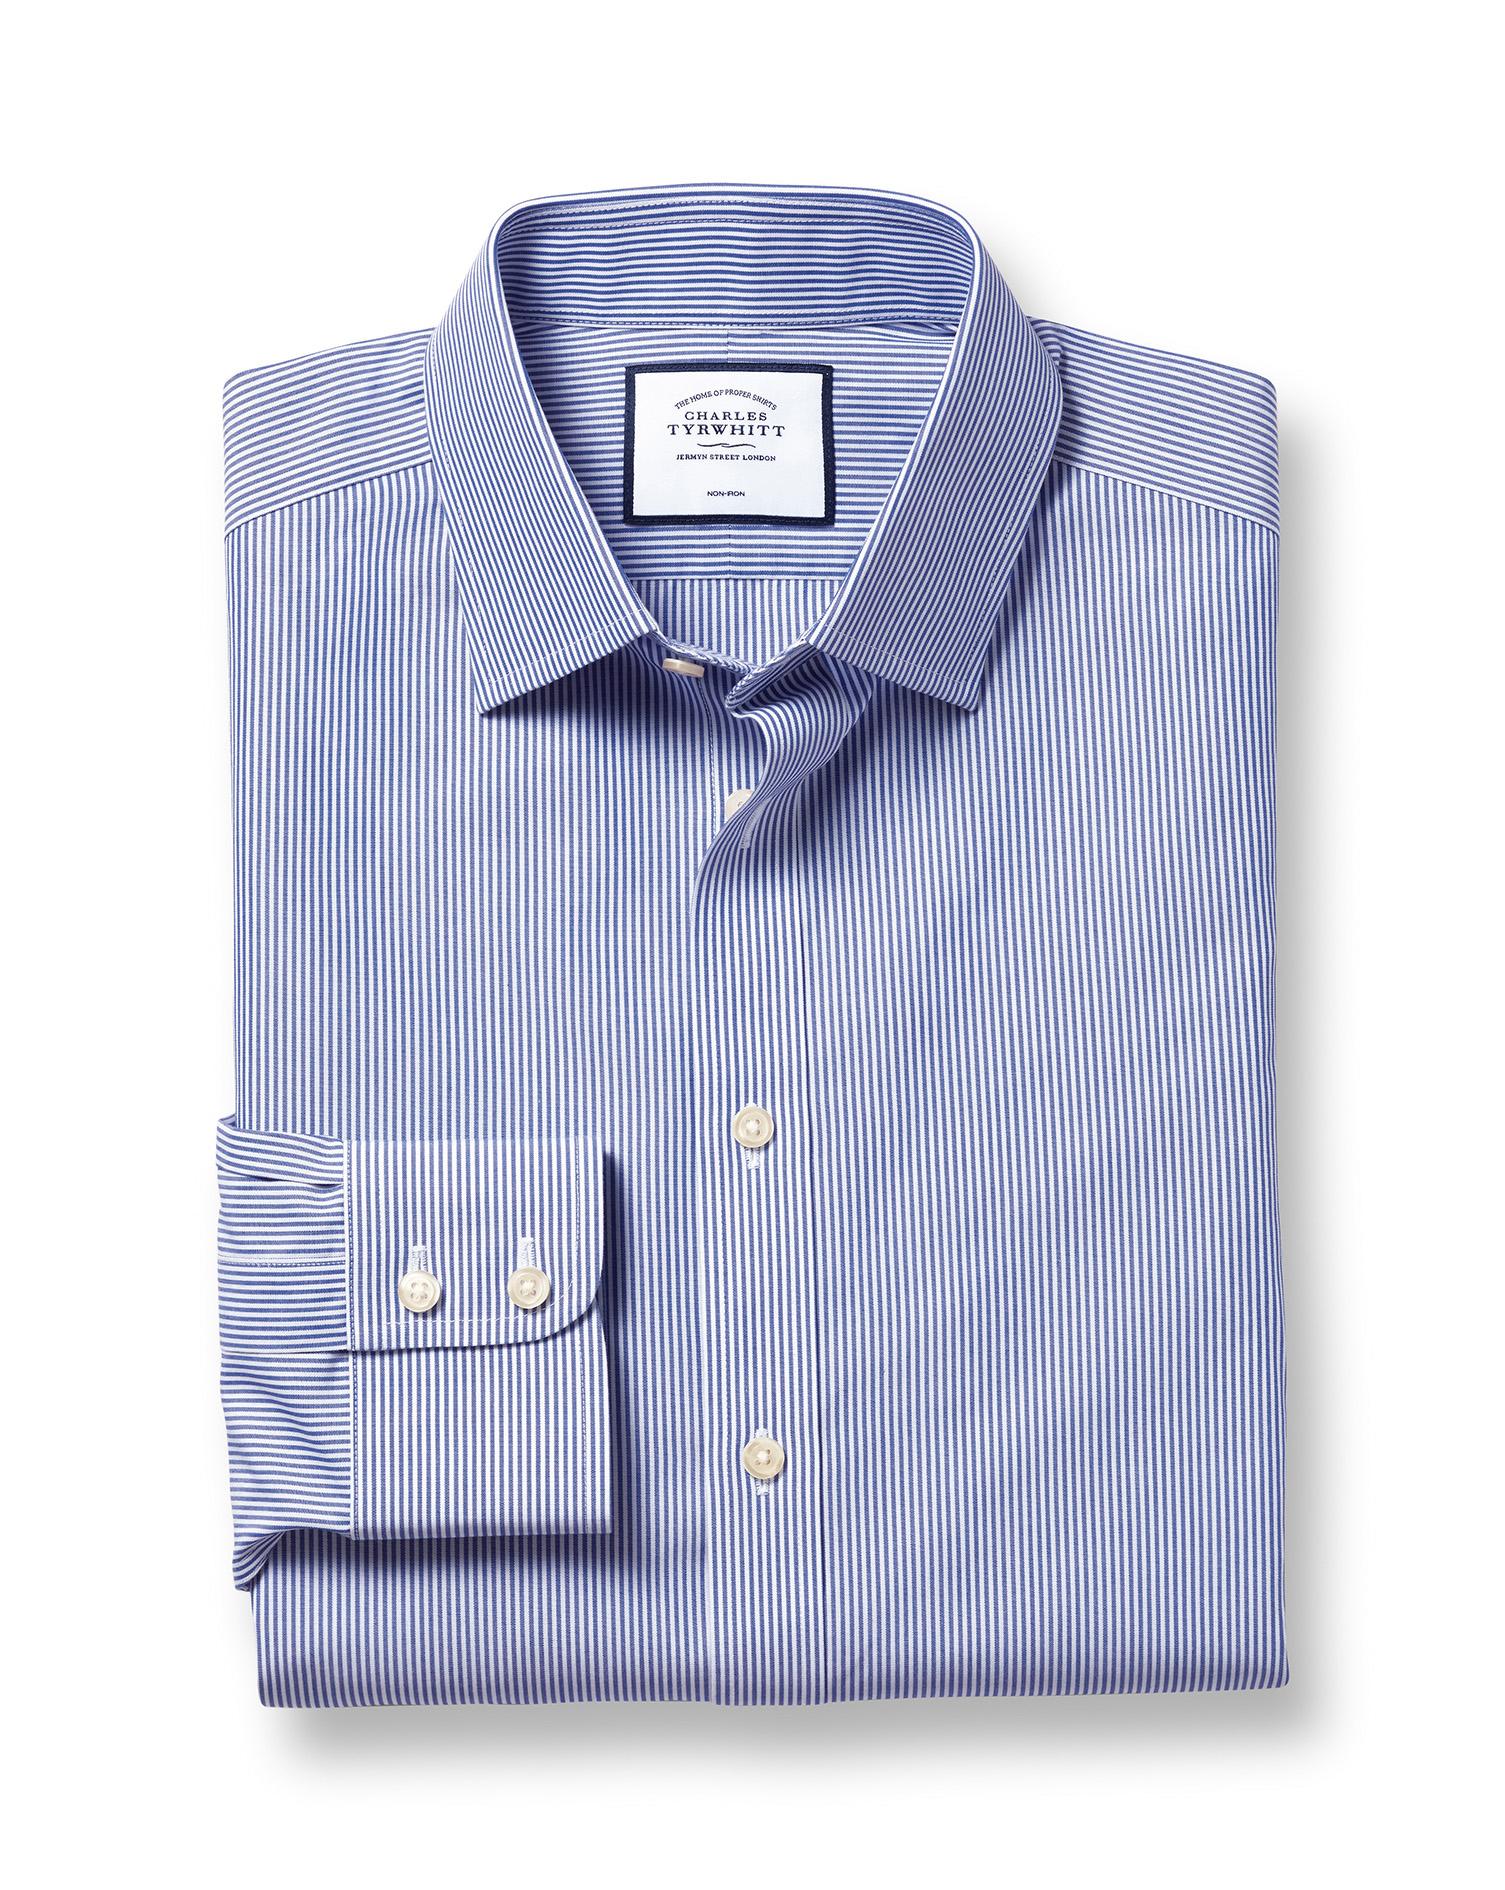 Slim fit non iron bengal stripe navy shirt charles tyrwhitt for Slim fit non iron shirts